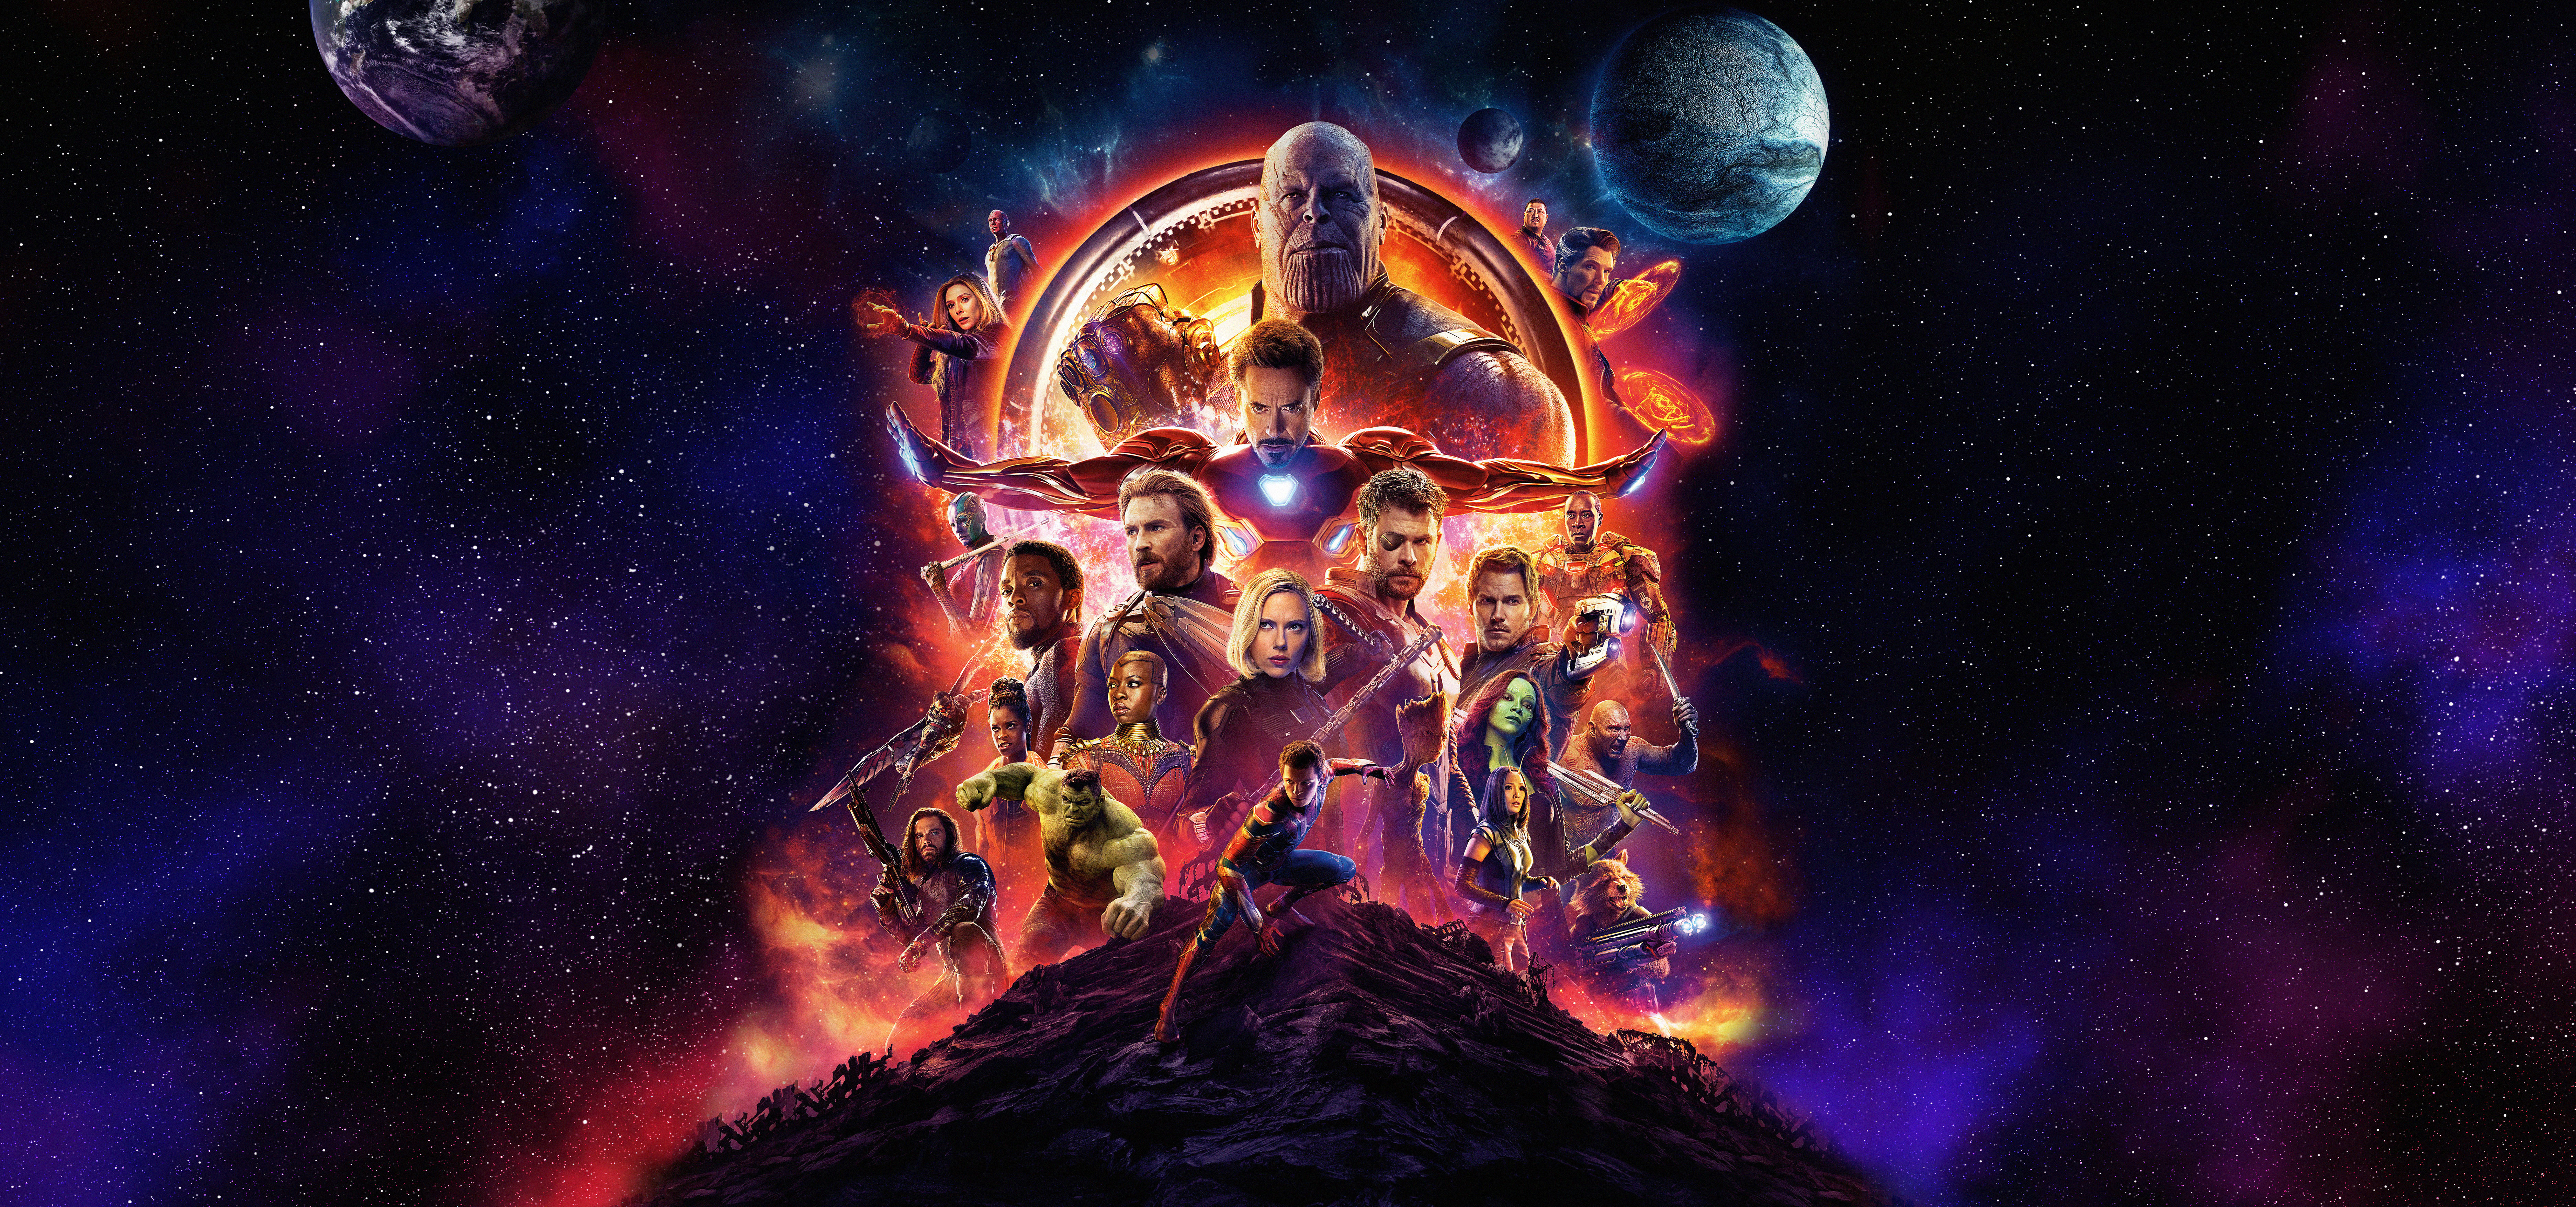 Fondos de pantalla Avengers Infinity War